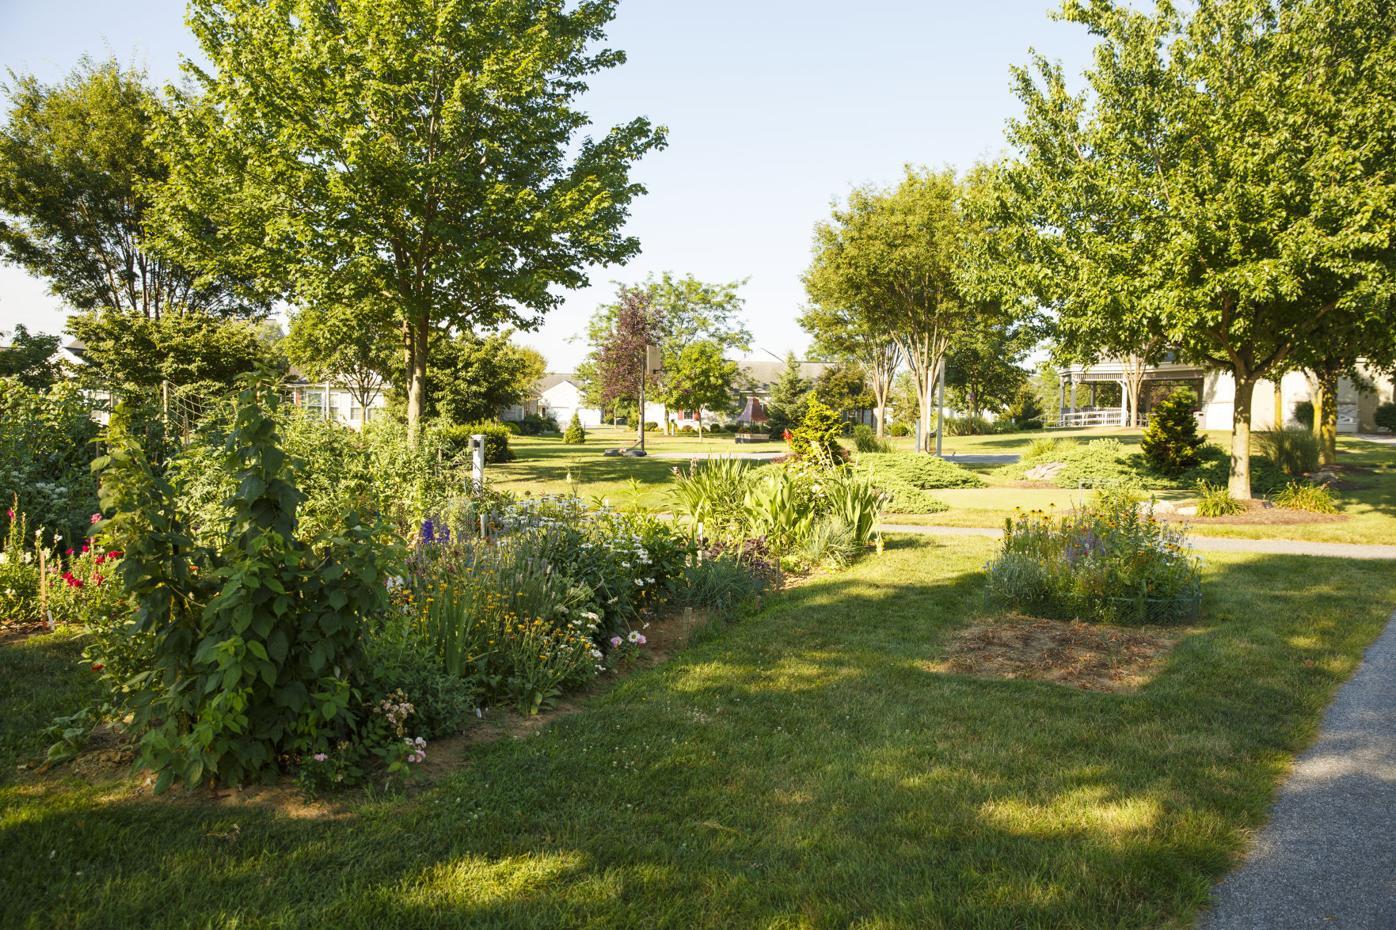 Garden Spot gardens